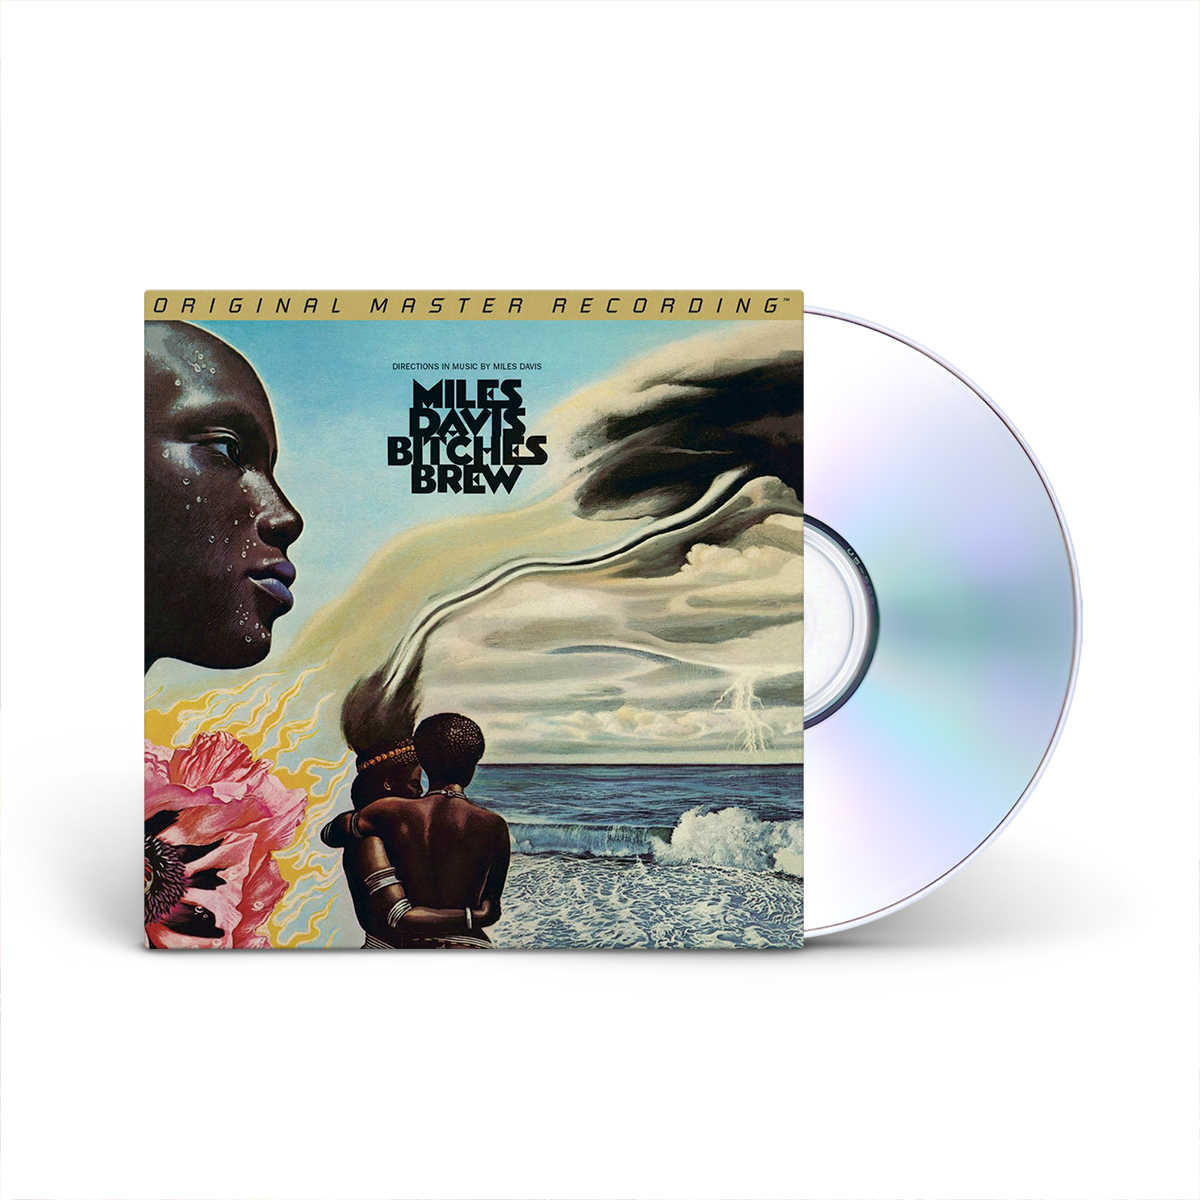 Miles Davis - Bitches Brew (Numbered Hybrid 2 x SACD)